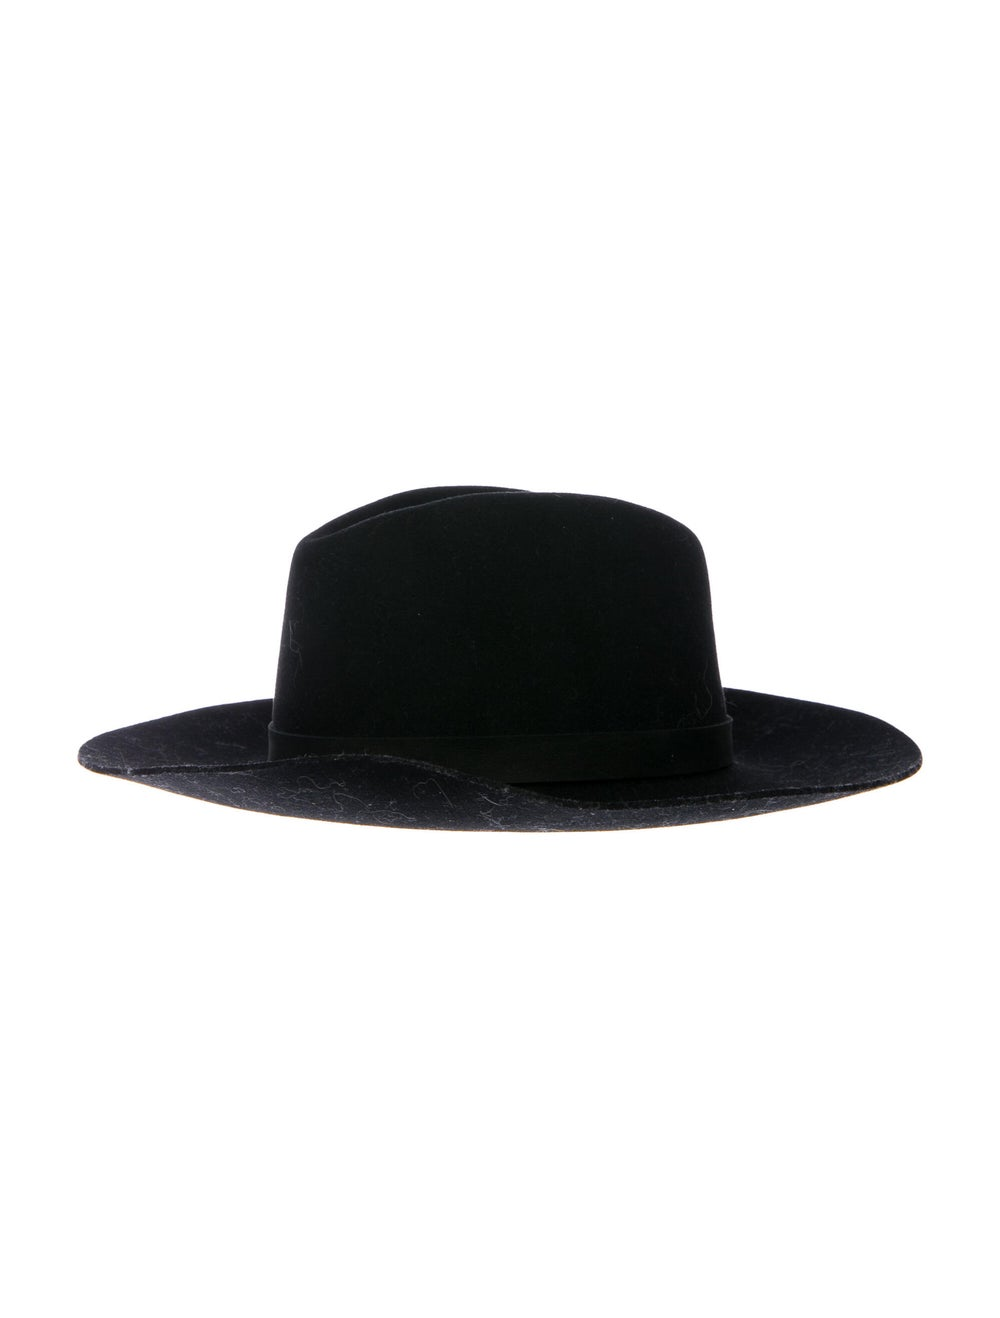 Janessa Leone Wool Felt Hat Black - image 1